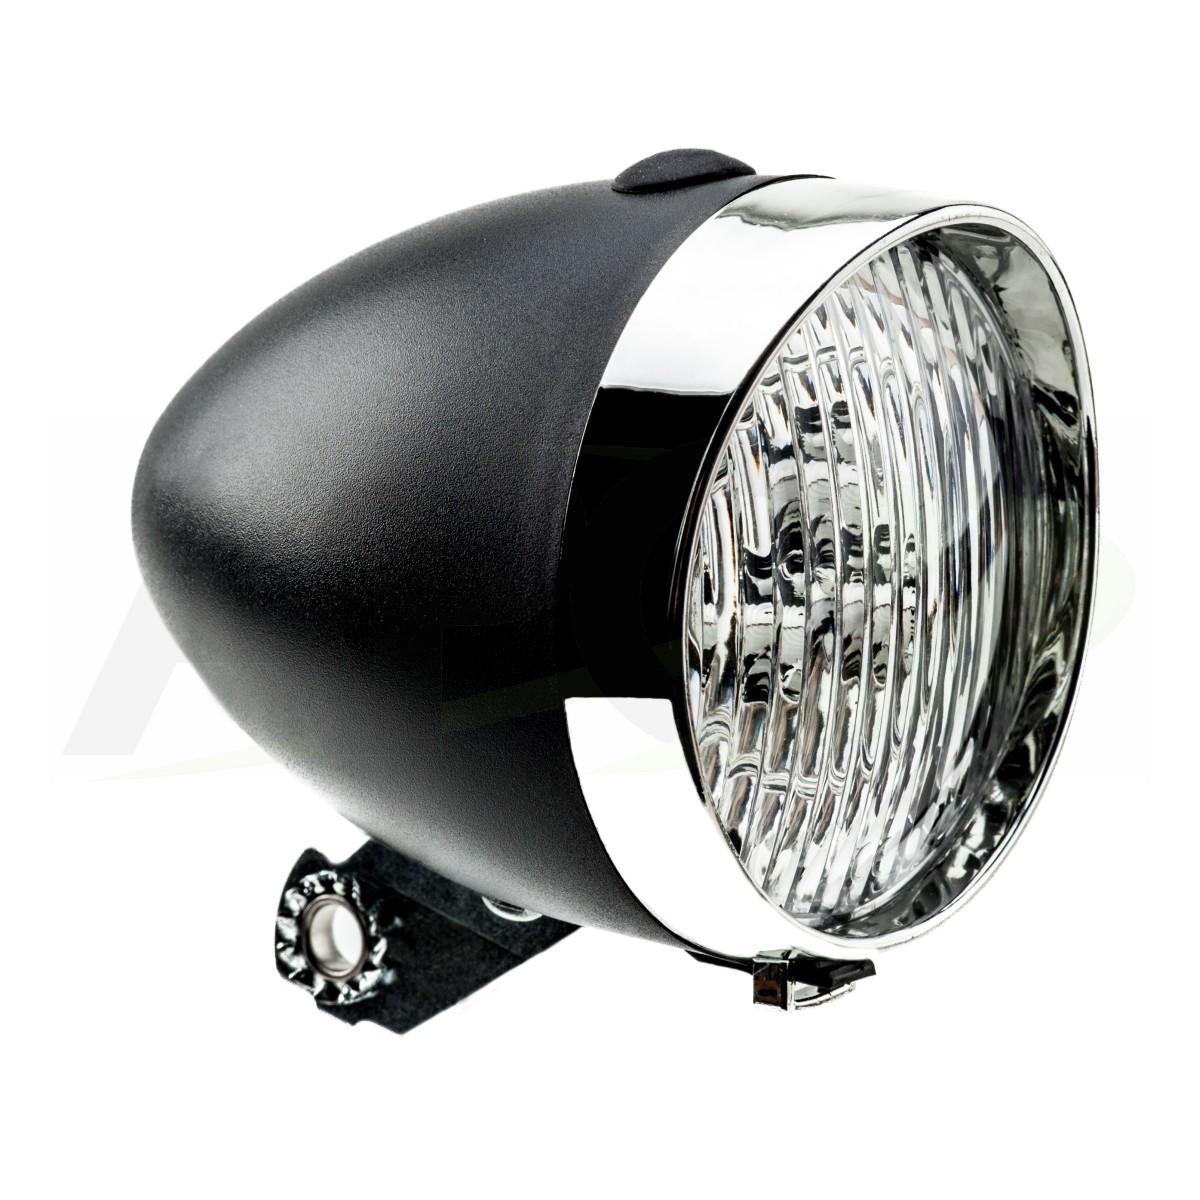 LAMPA BATERYJNA PRZÓD HW 160302 B czarna